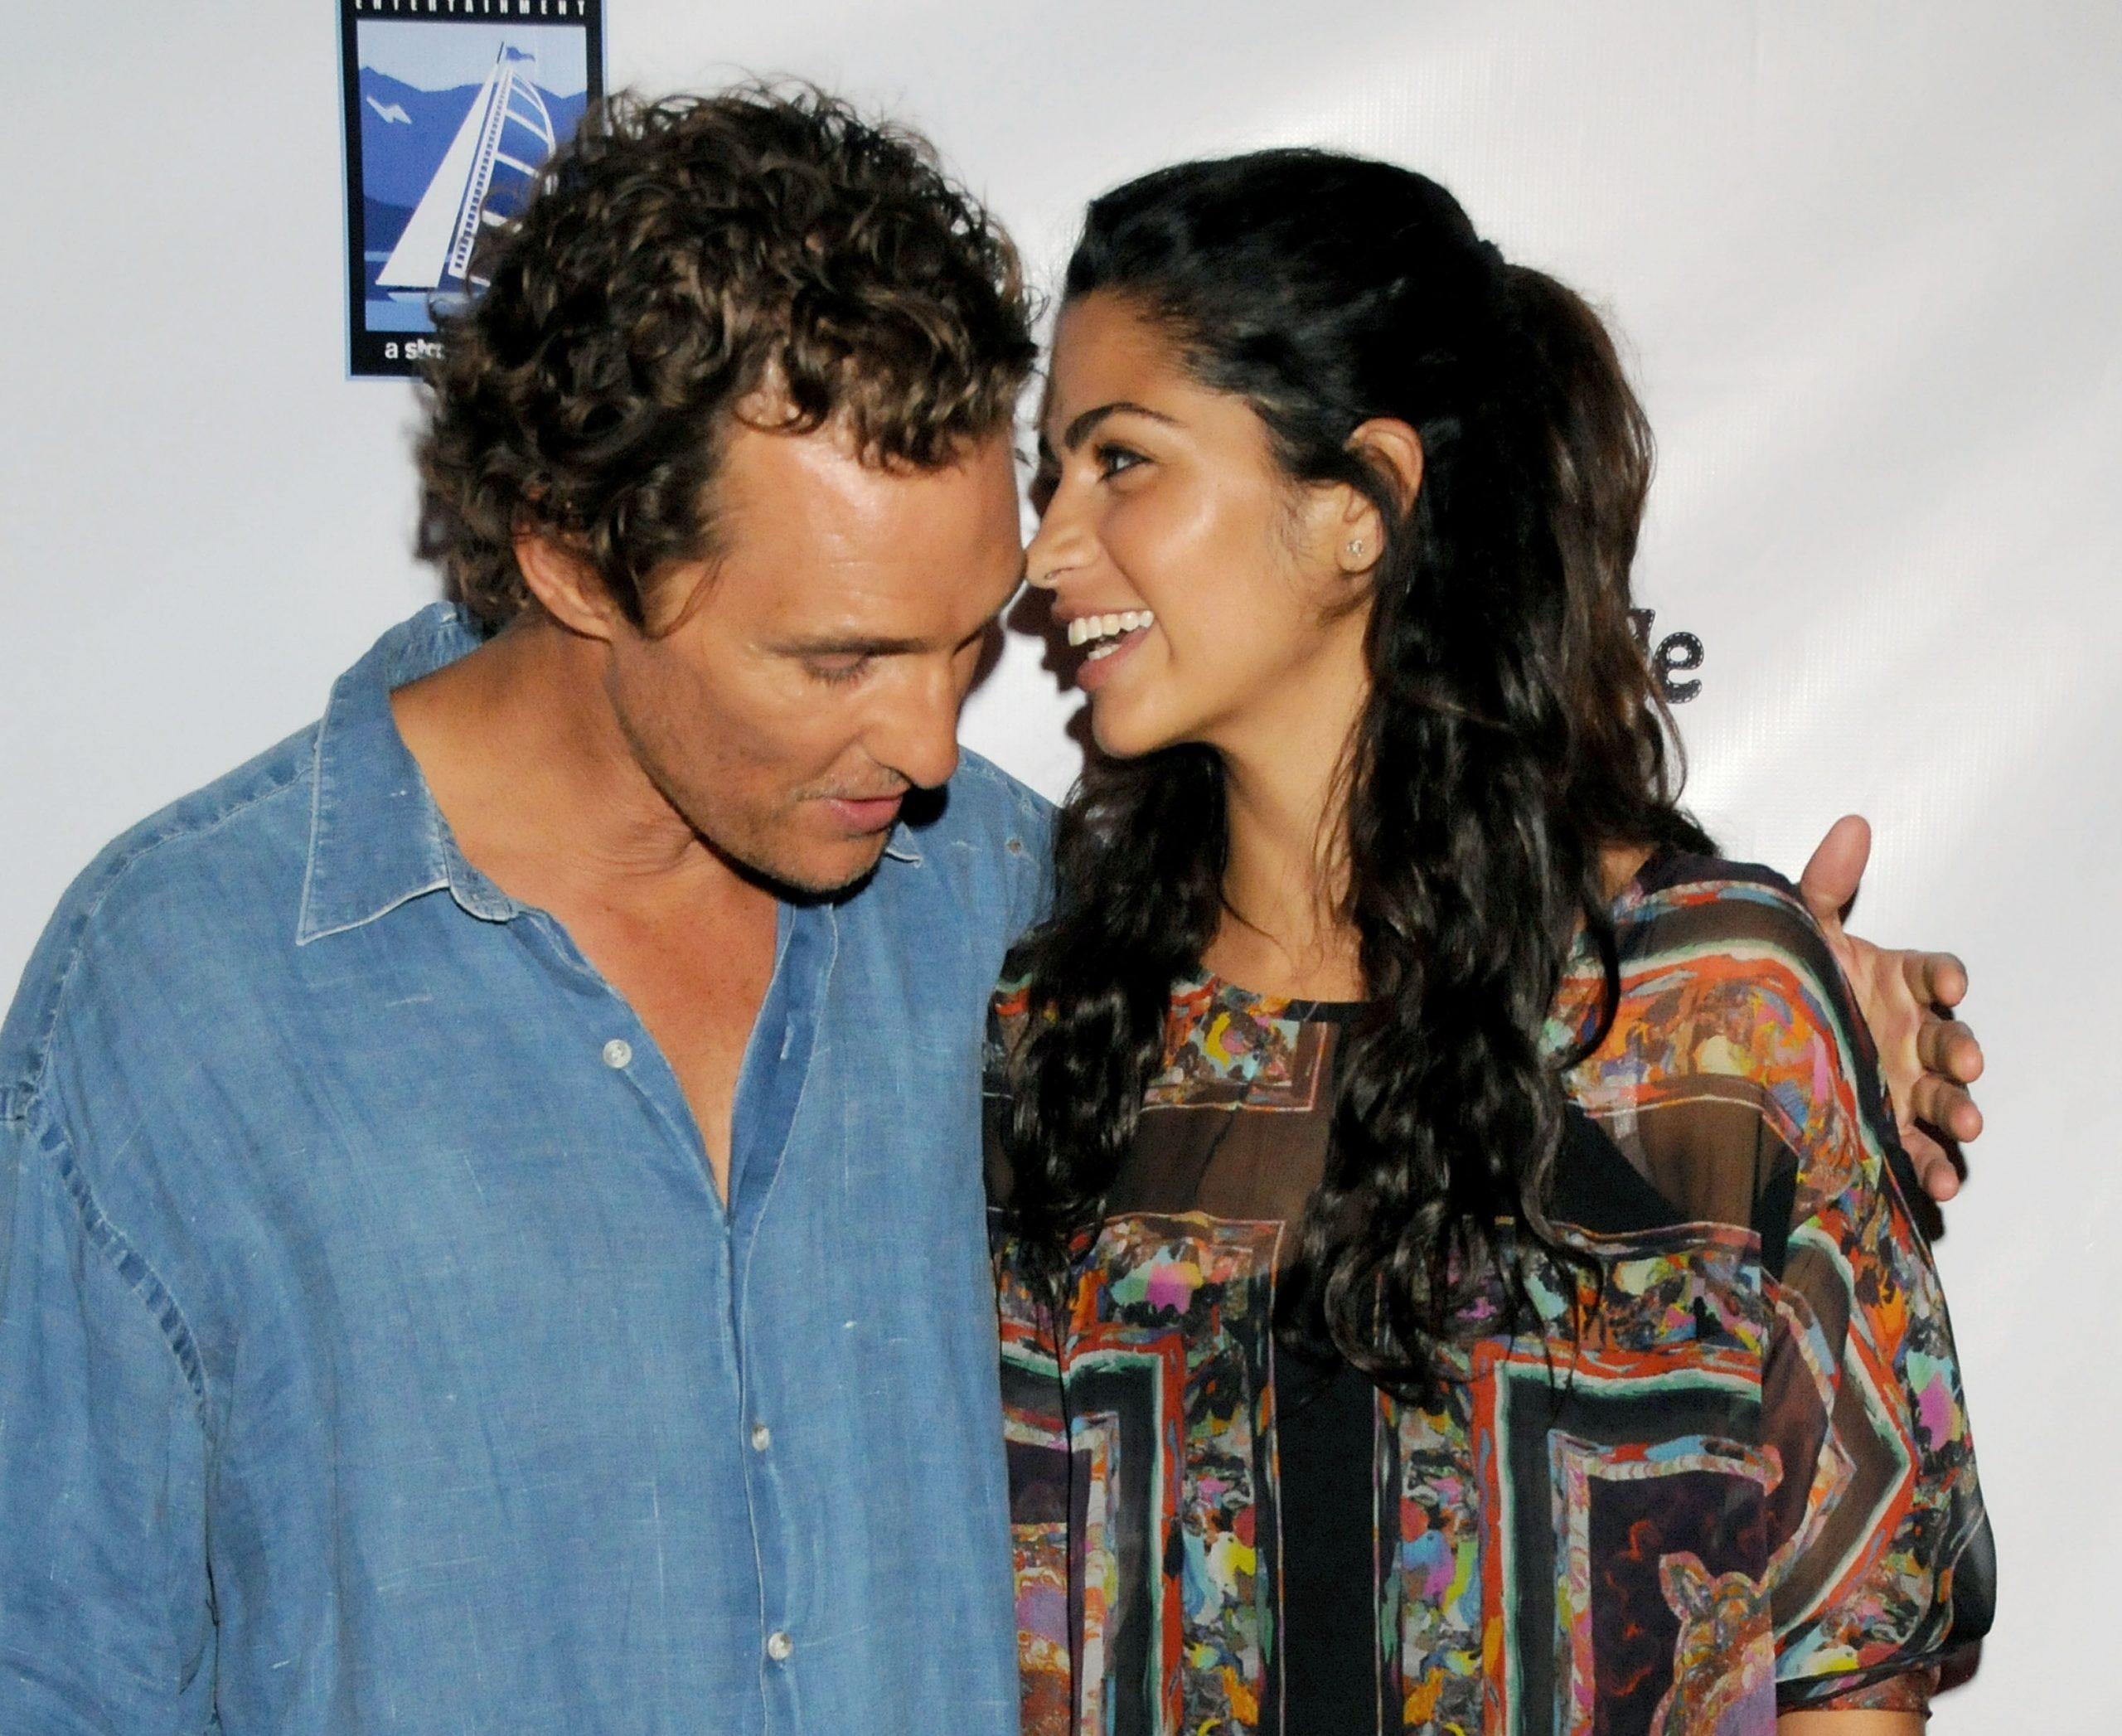 Actor Matthew McConaughey and Designer Camila Alves